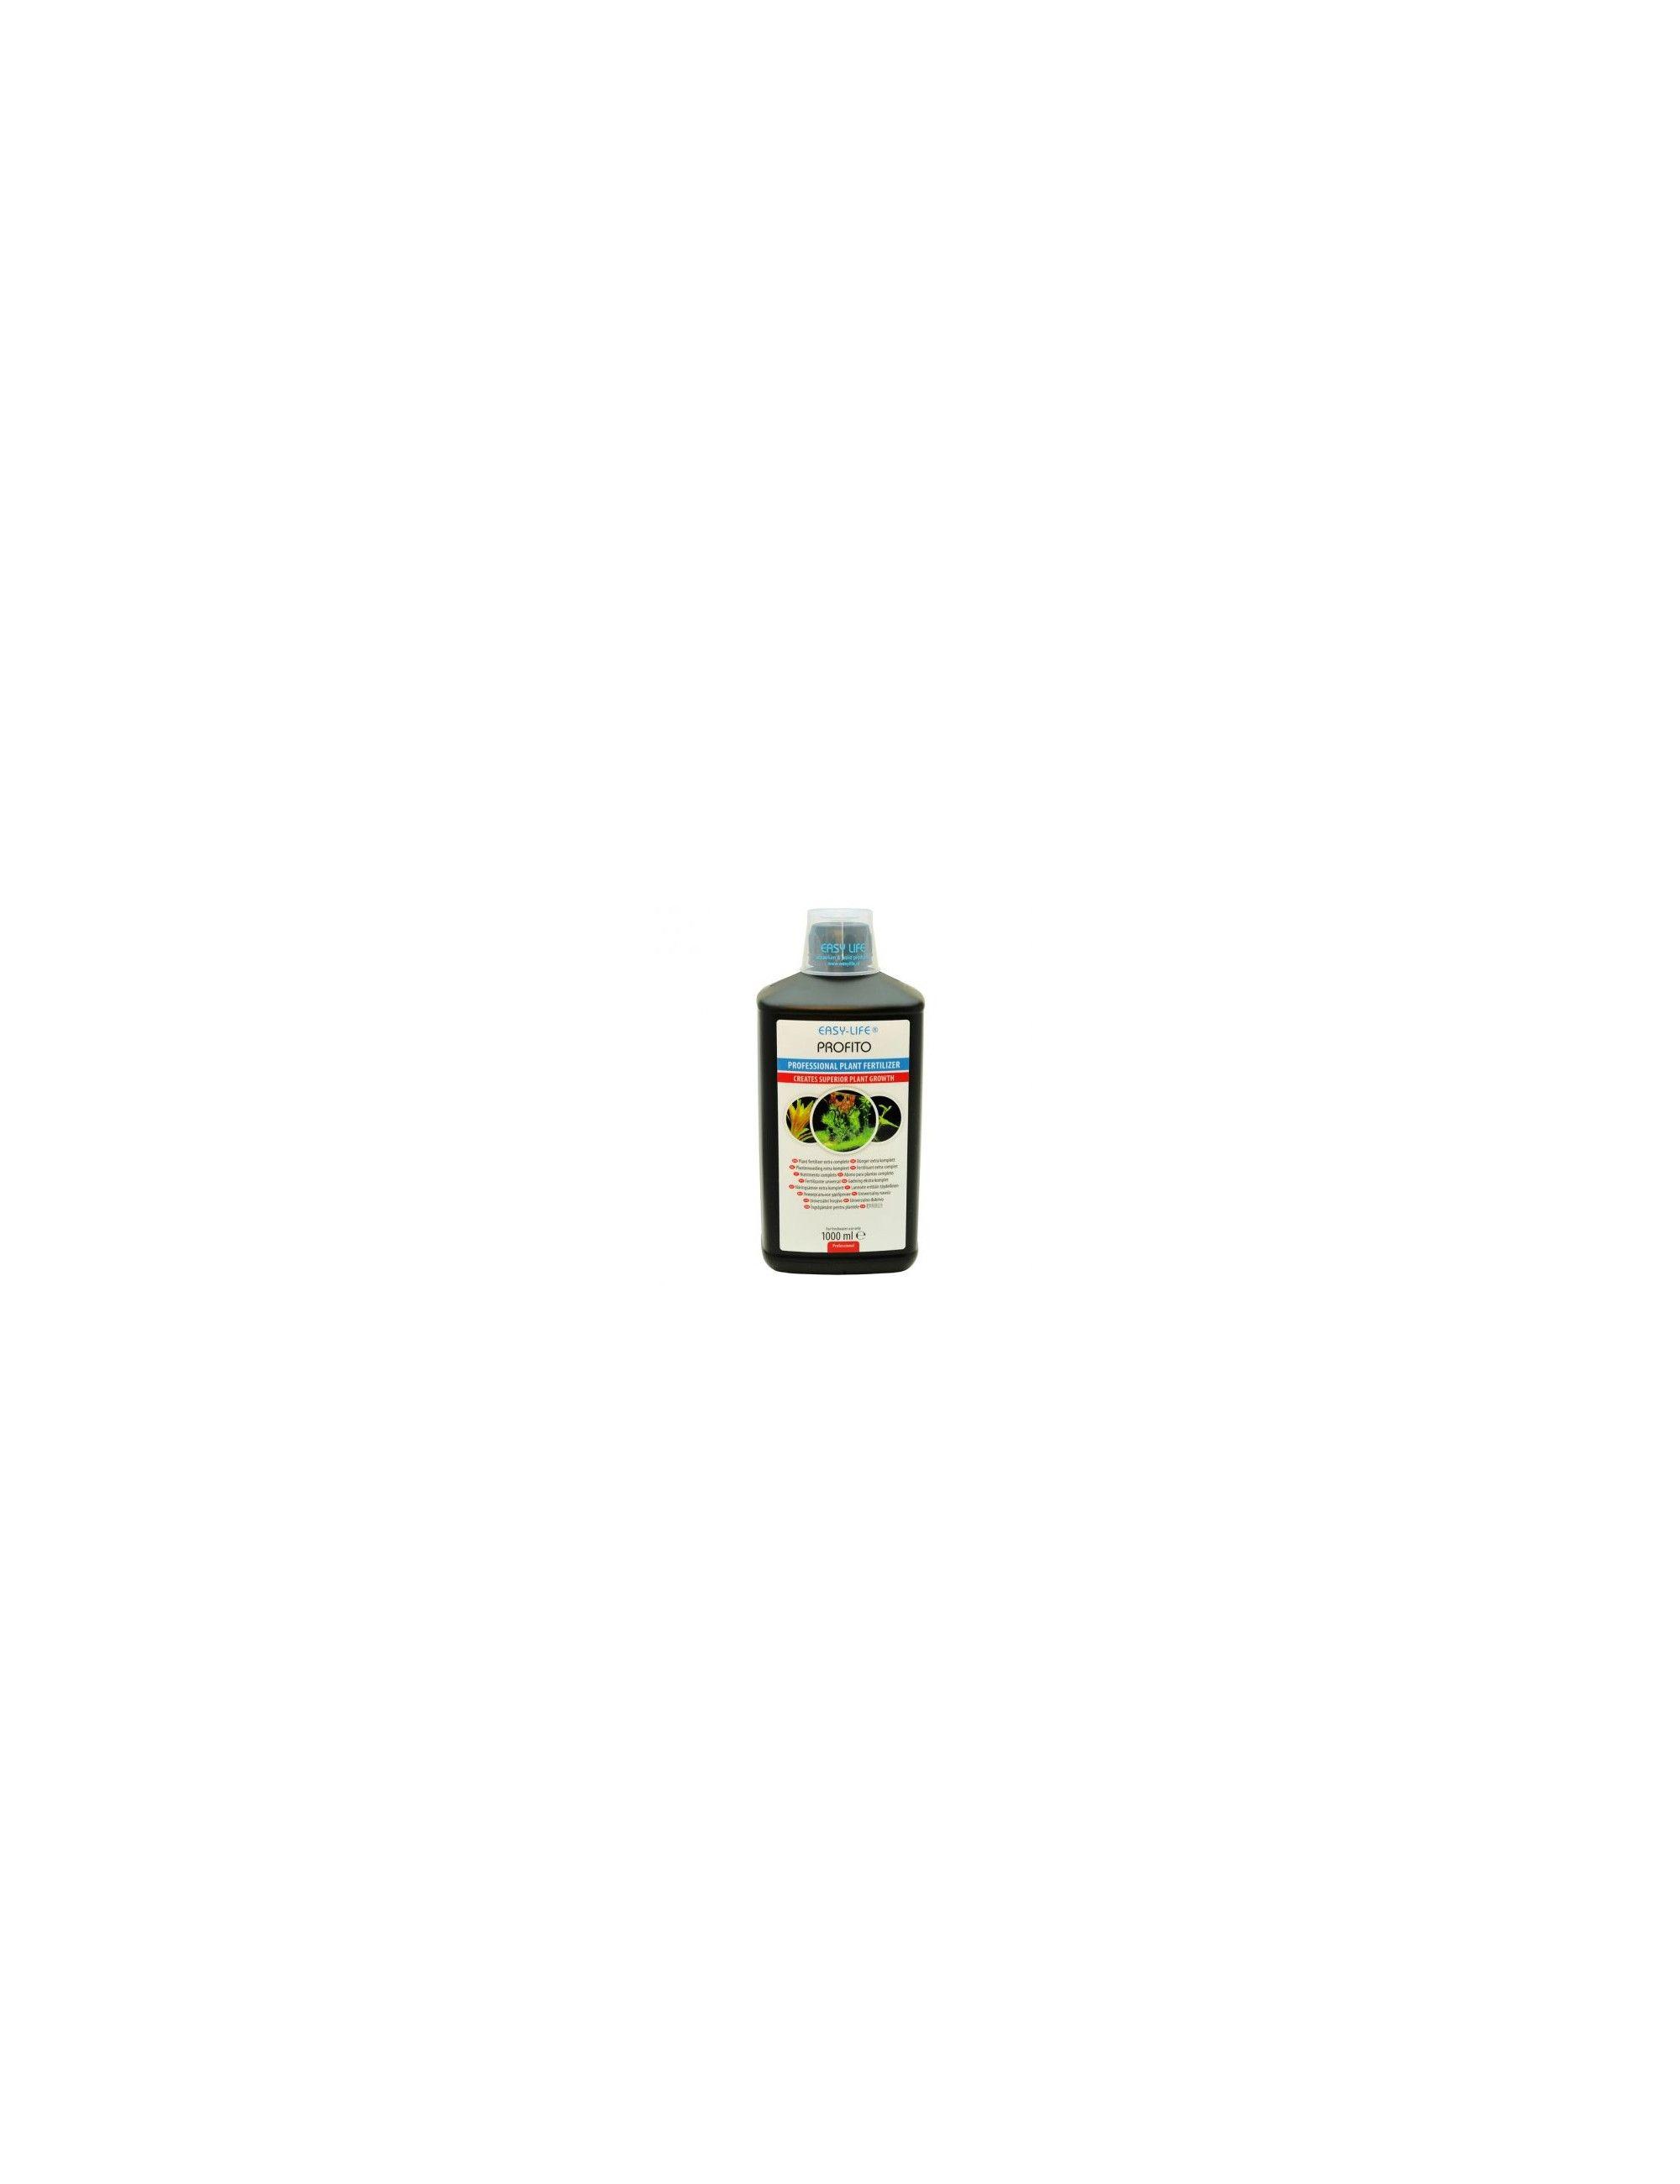 EASY LIFE - Profito - 1000ml - Fertilisant pour aquarium